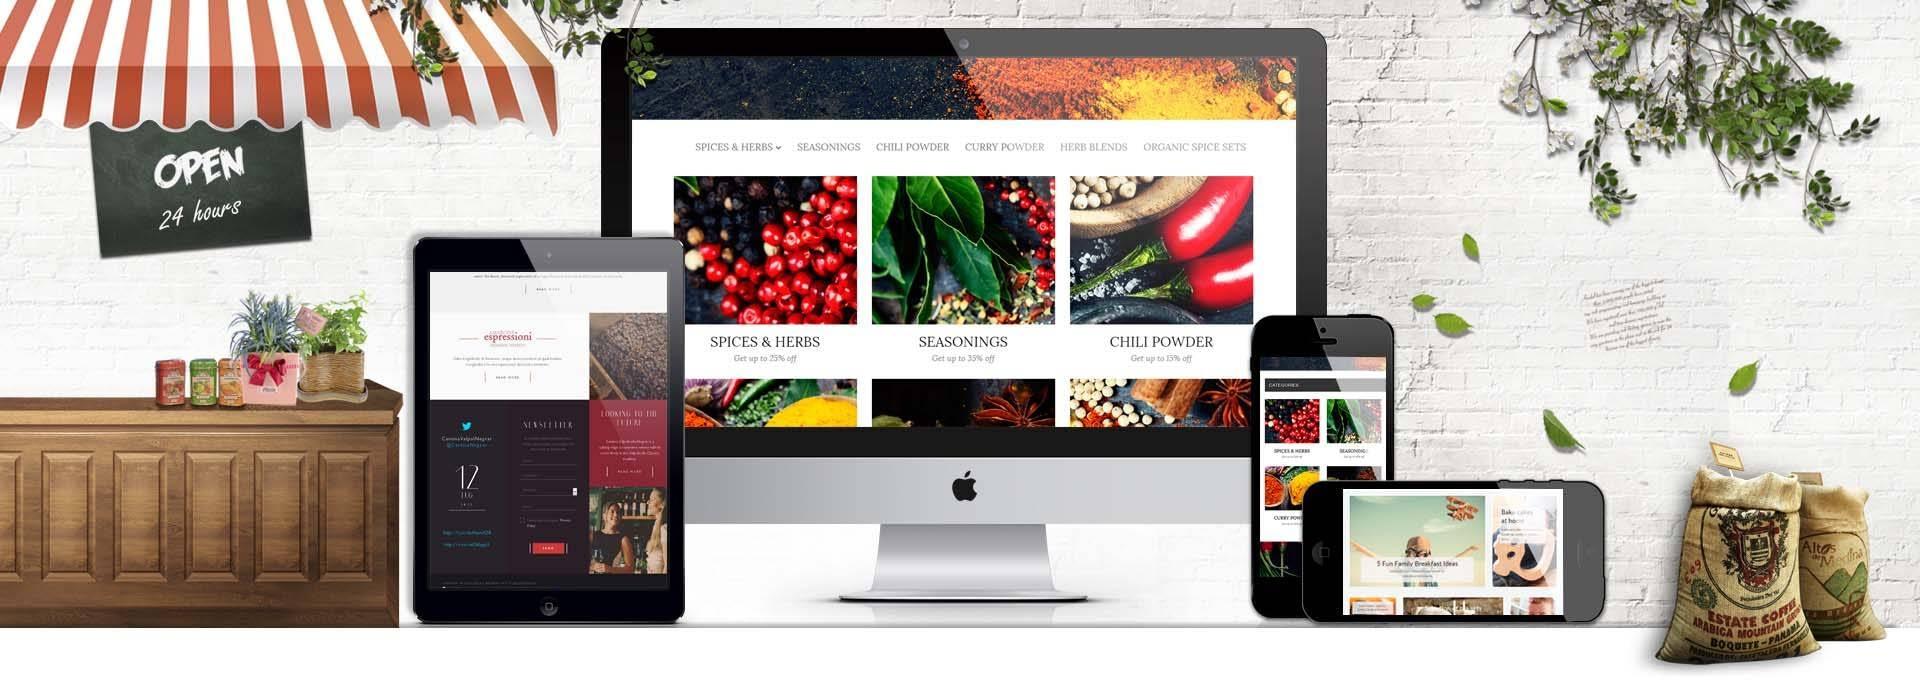 diseño de tiendas online en avilés